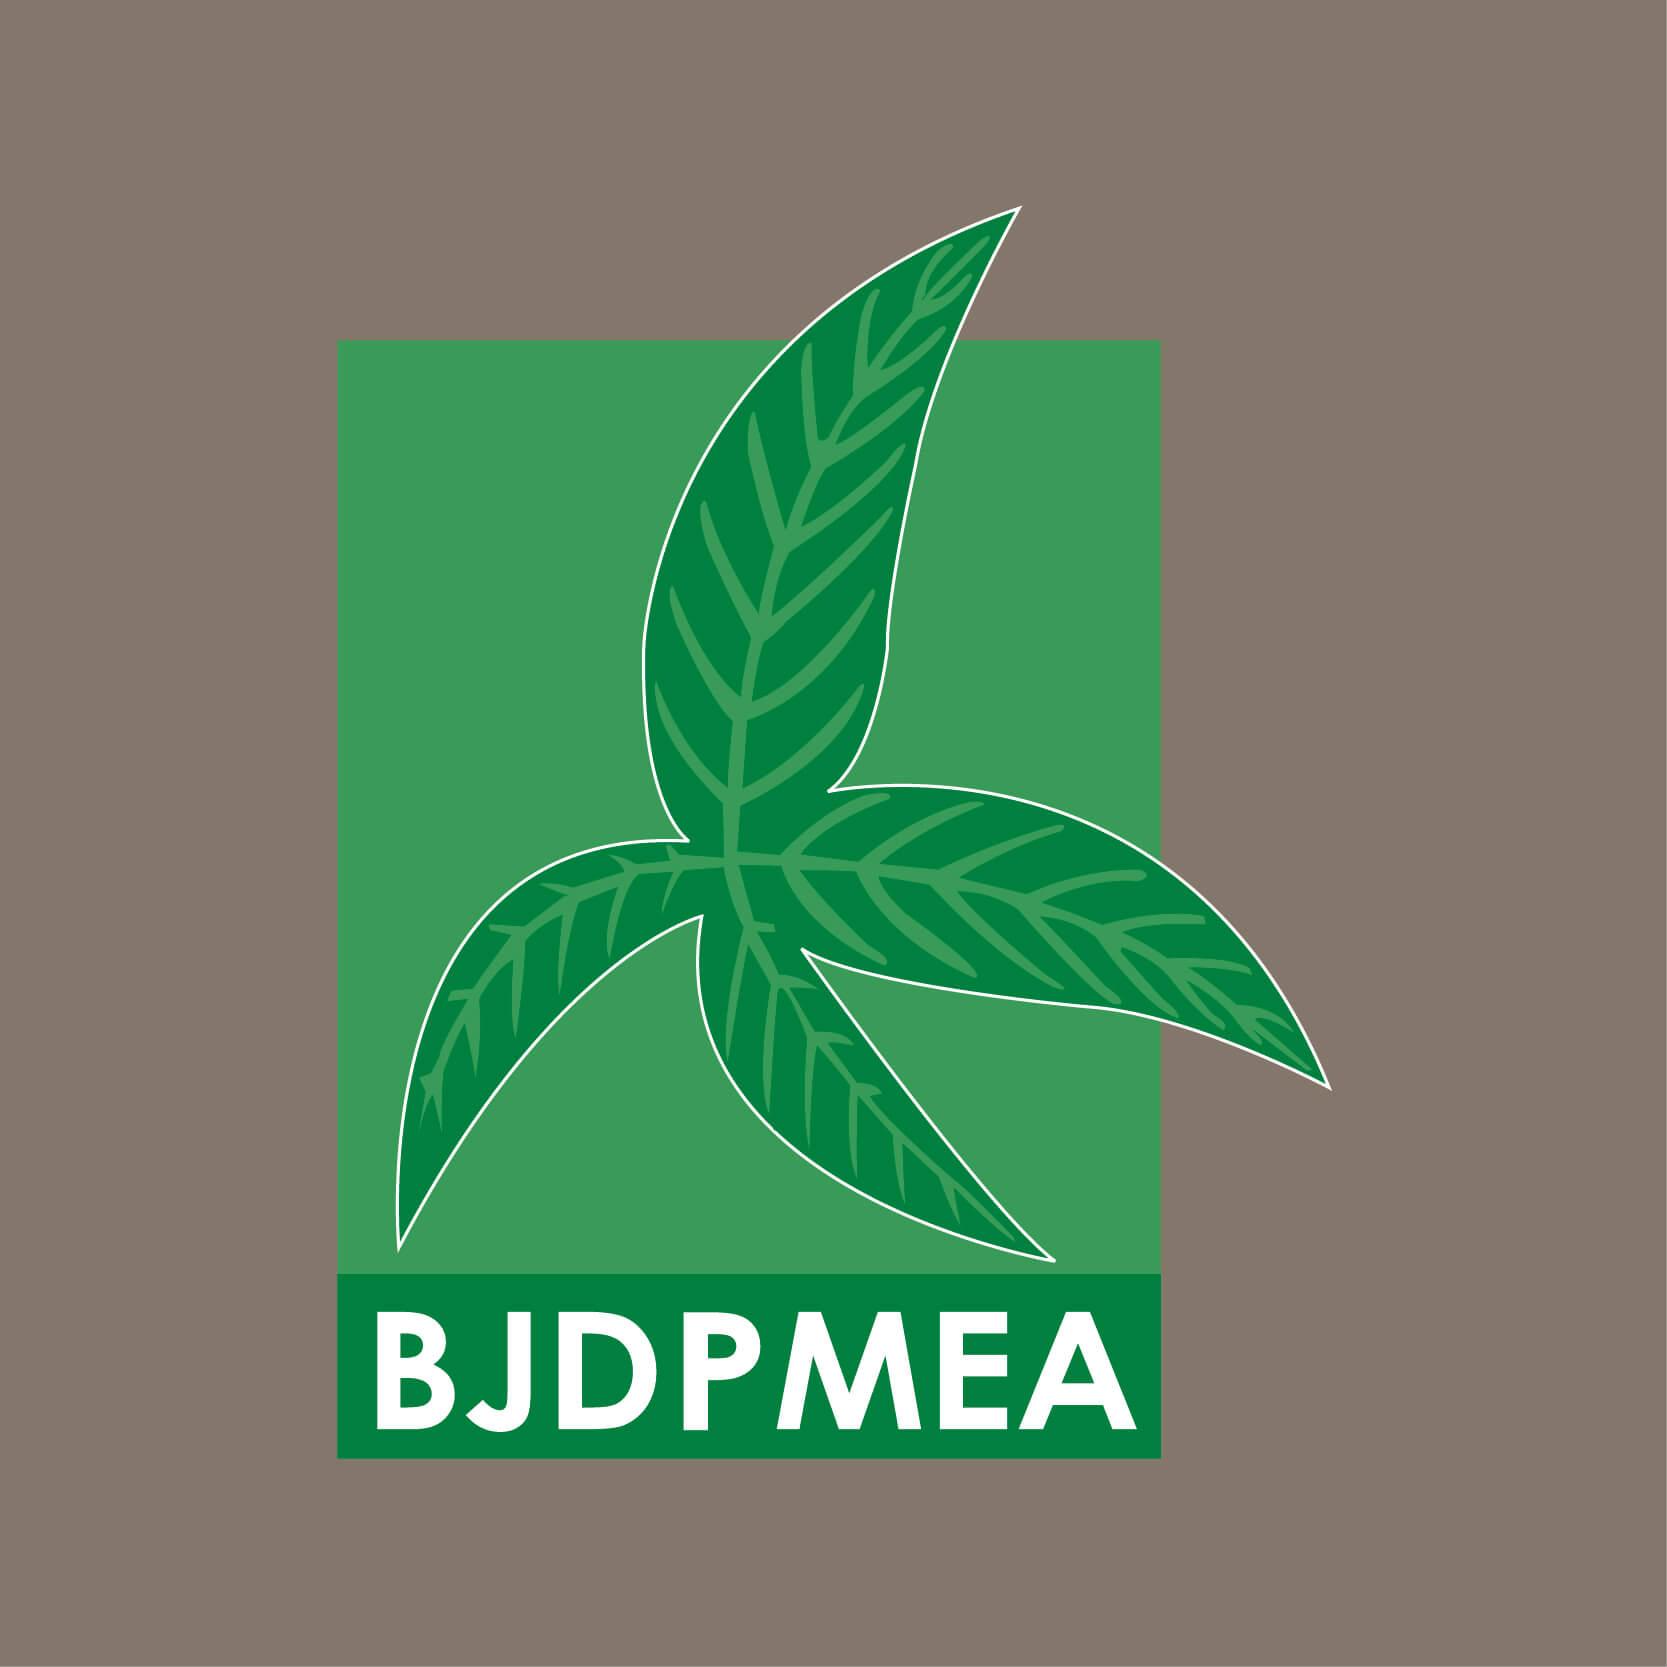 DTC-Clients-Served-Logo-BJDPMEA